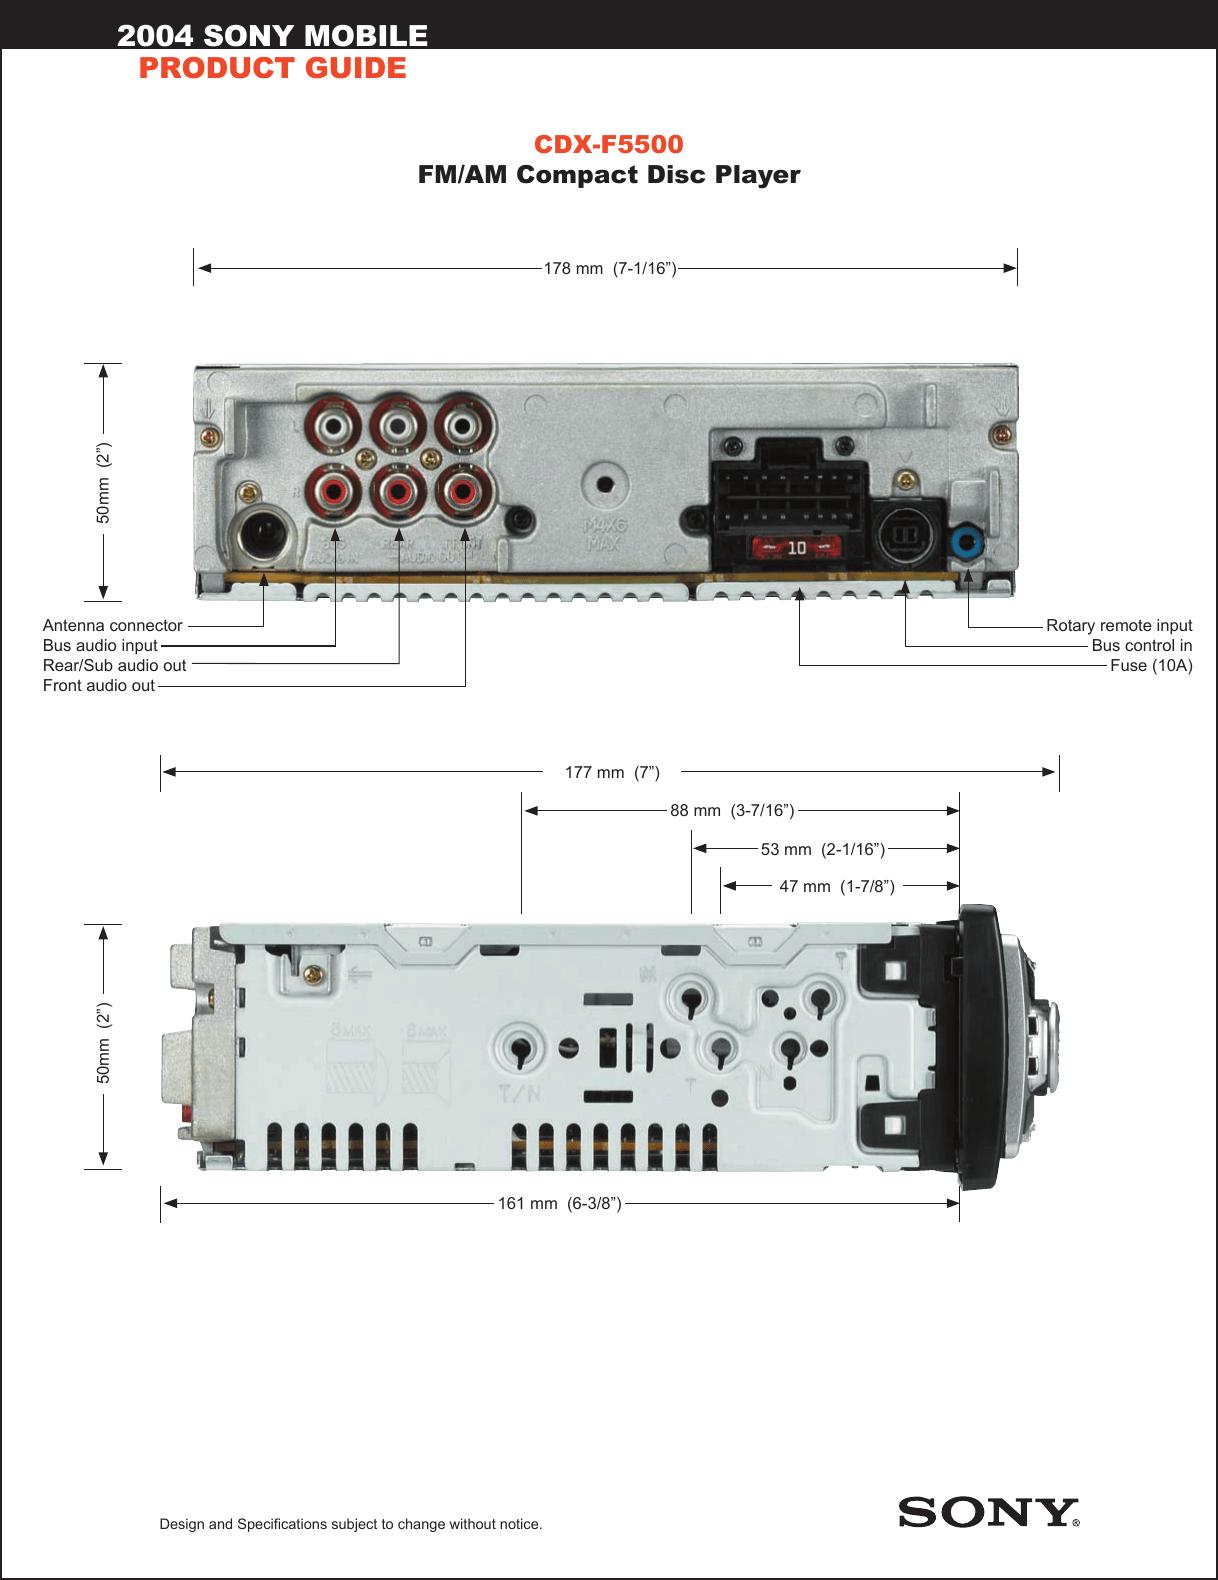 hight resolution of sony cdx f5500 marketing specifications sony m 610 wiring harness diagram sony cdx f5500 wiring diagram